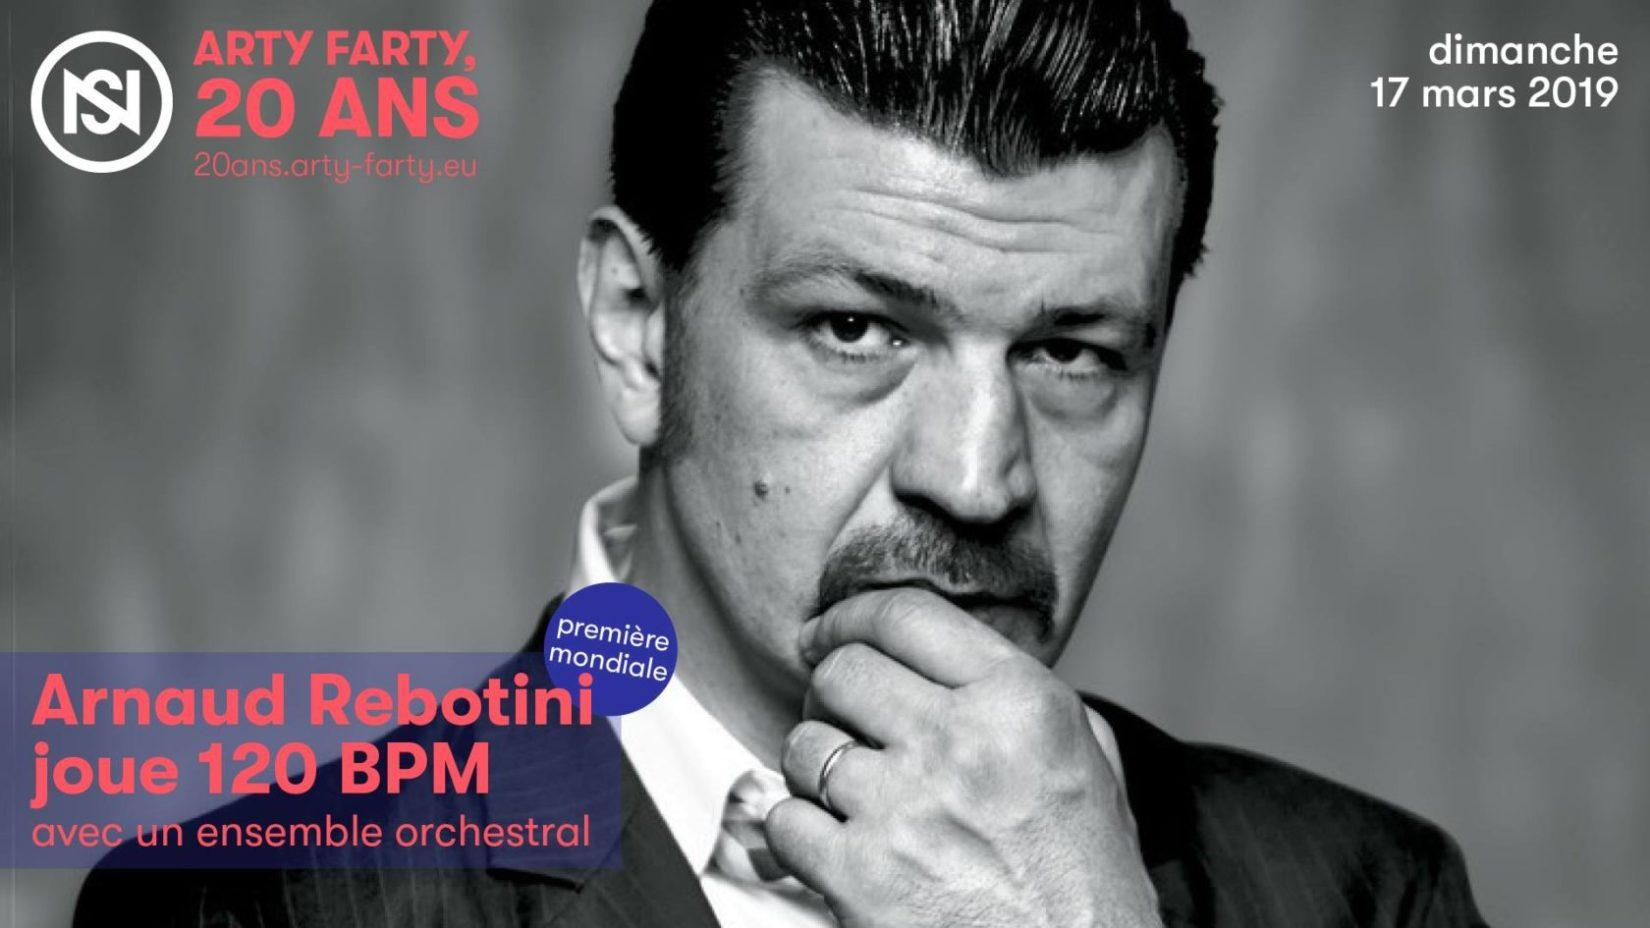 Arnaud Rebotini joue 120 BPM avec un ensemble orchestral